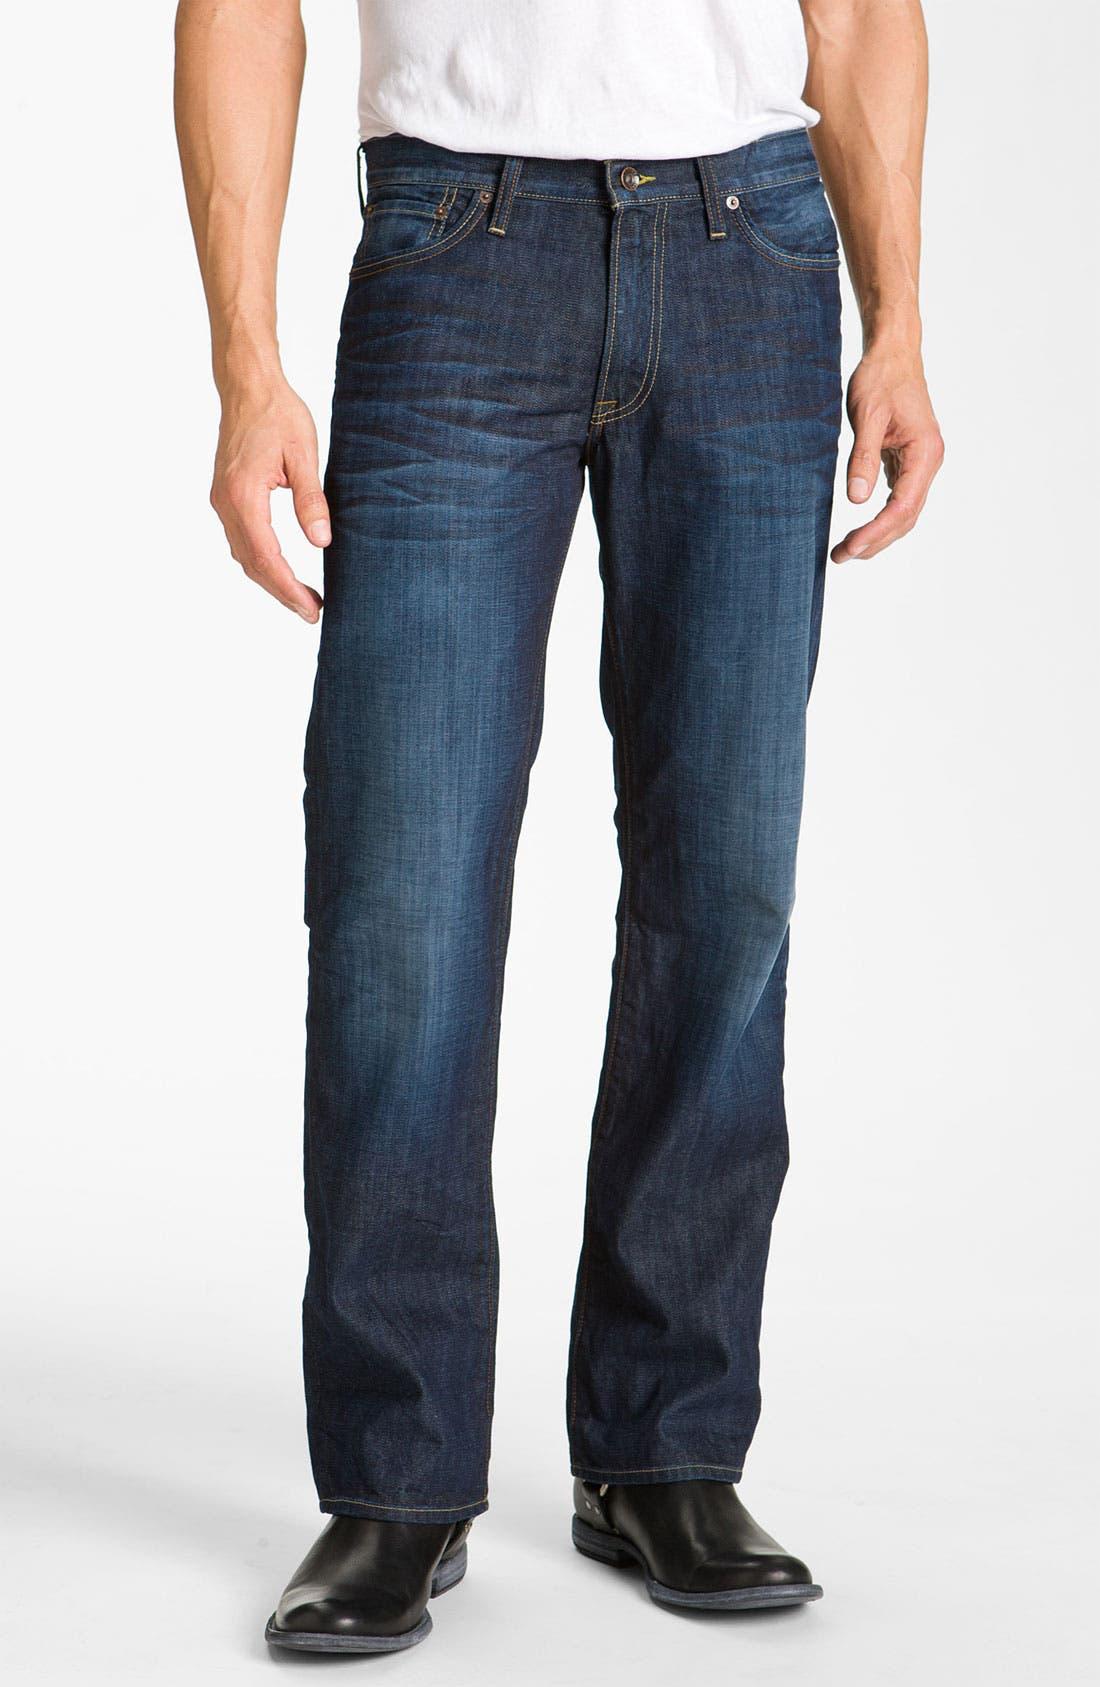 Alternate Image 1 Selected - Lucky Brand '361 Vintage' Straight Leg Jeans (Dark Creek)